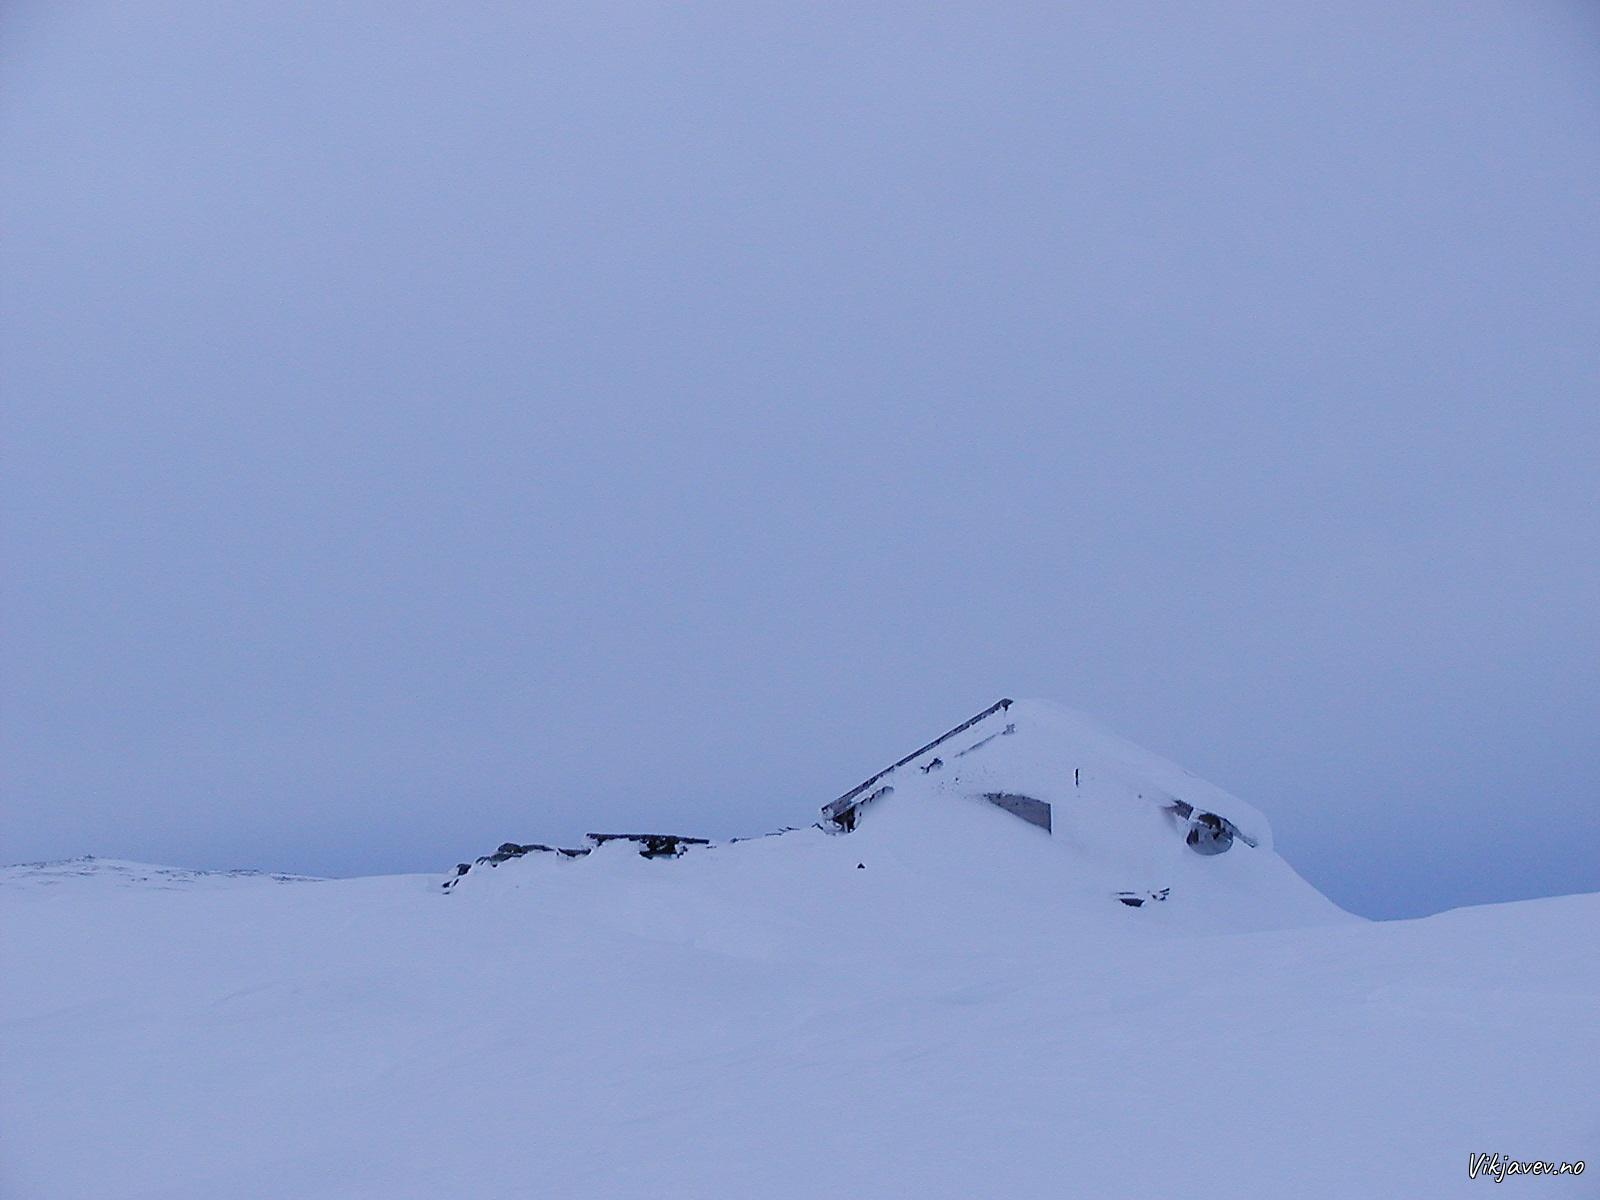 Sel i Ovrisfjellet